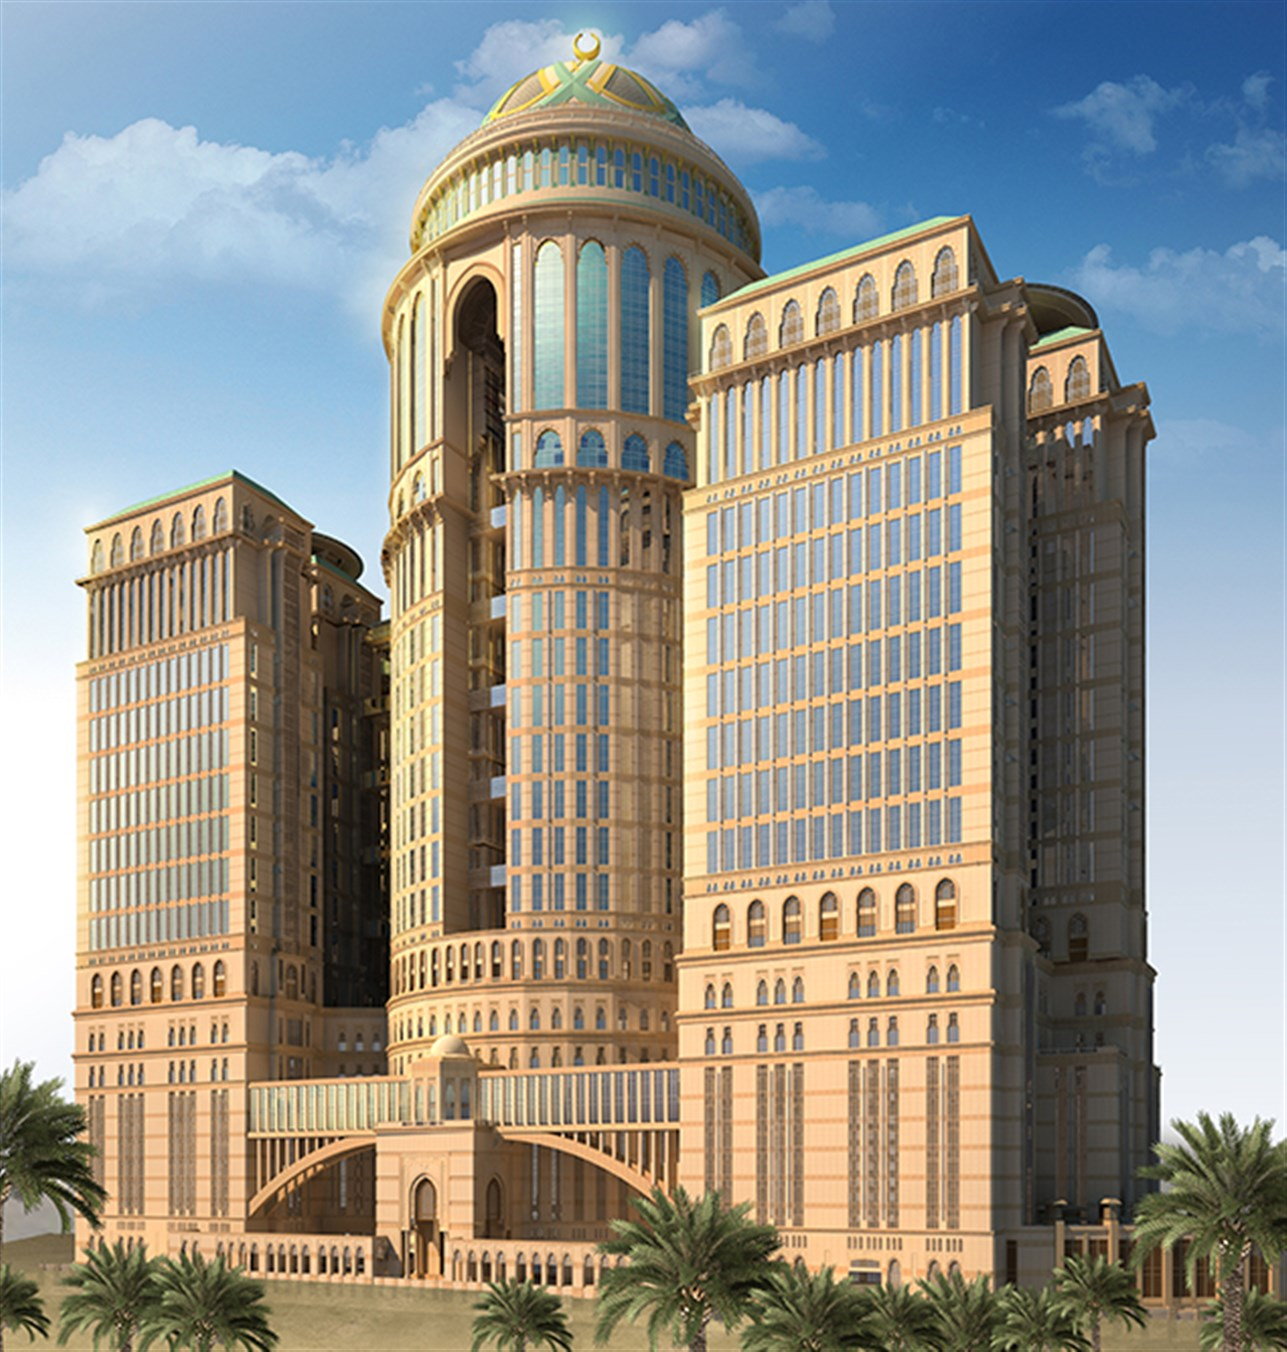 Abraj Kudai hotel in Mecca